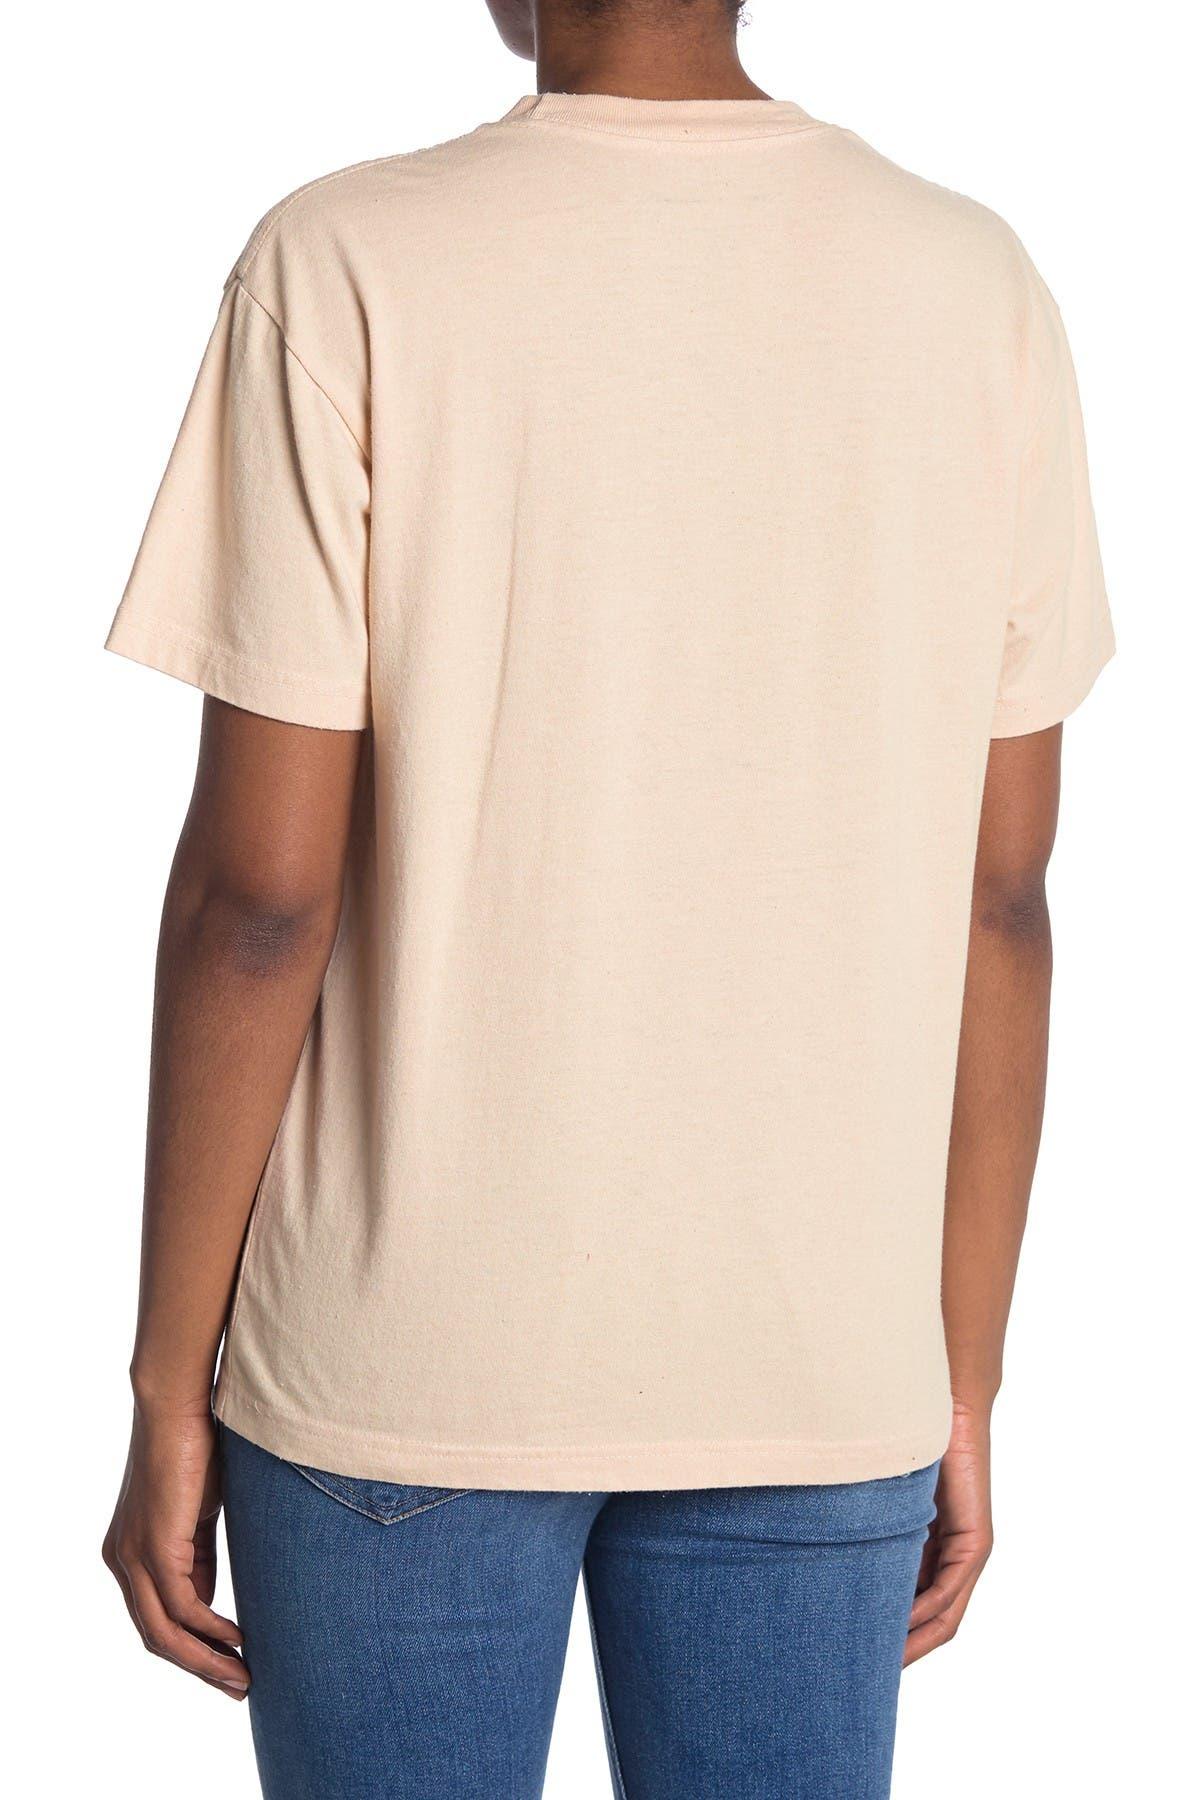 Image of Desert Dreamer Use Your Voice Pocket T-Shirt